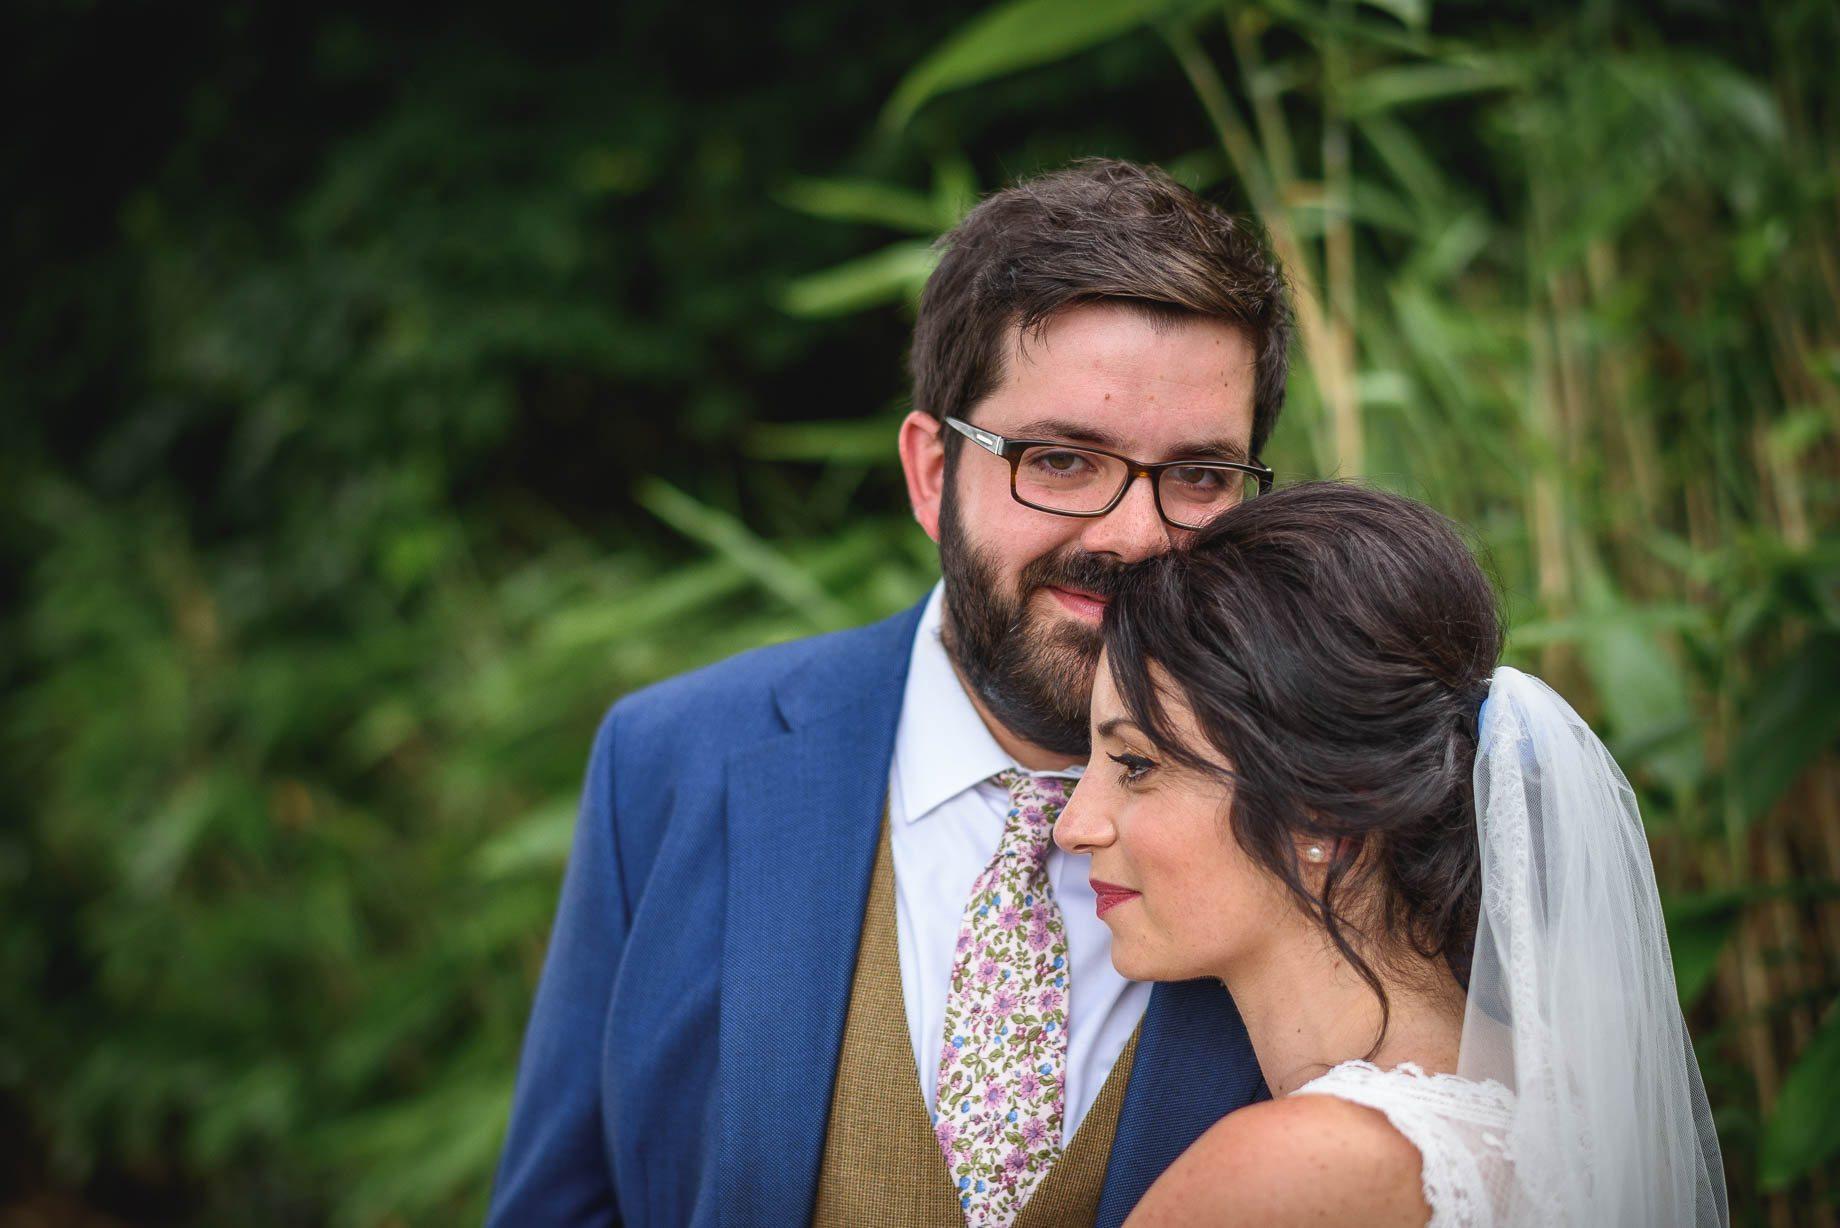 Gaynes Park wedding photography - Guy Collier Photography - Rachel and Jon (148 of 169)